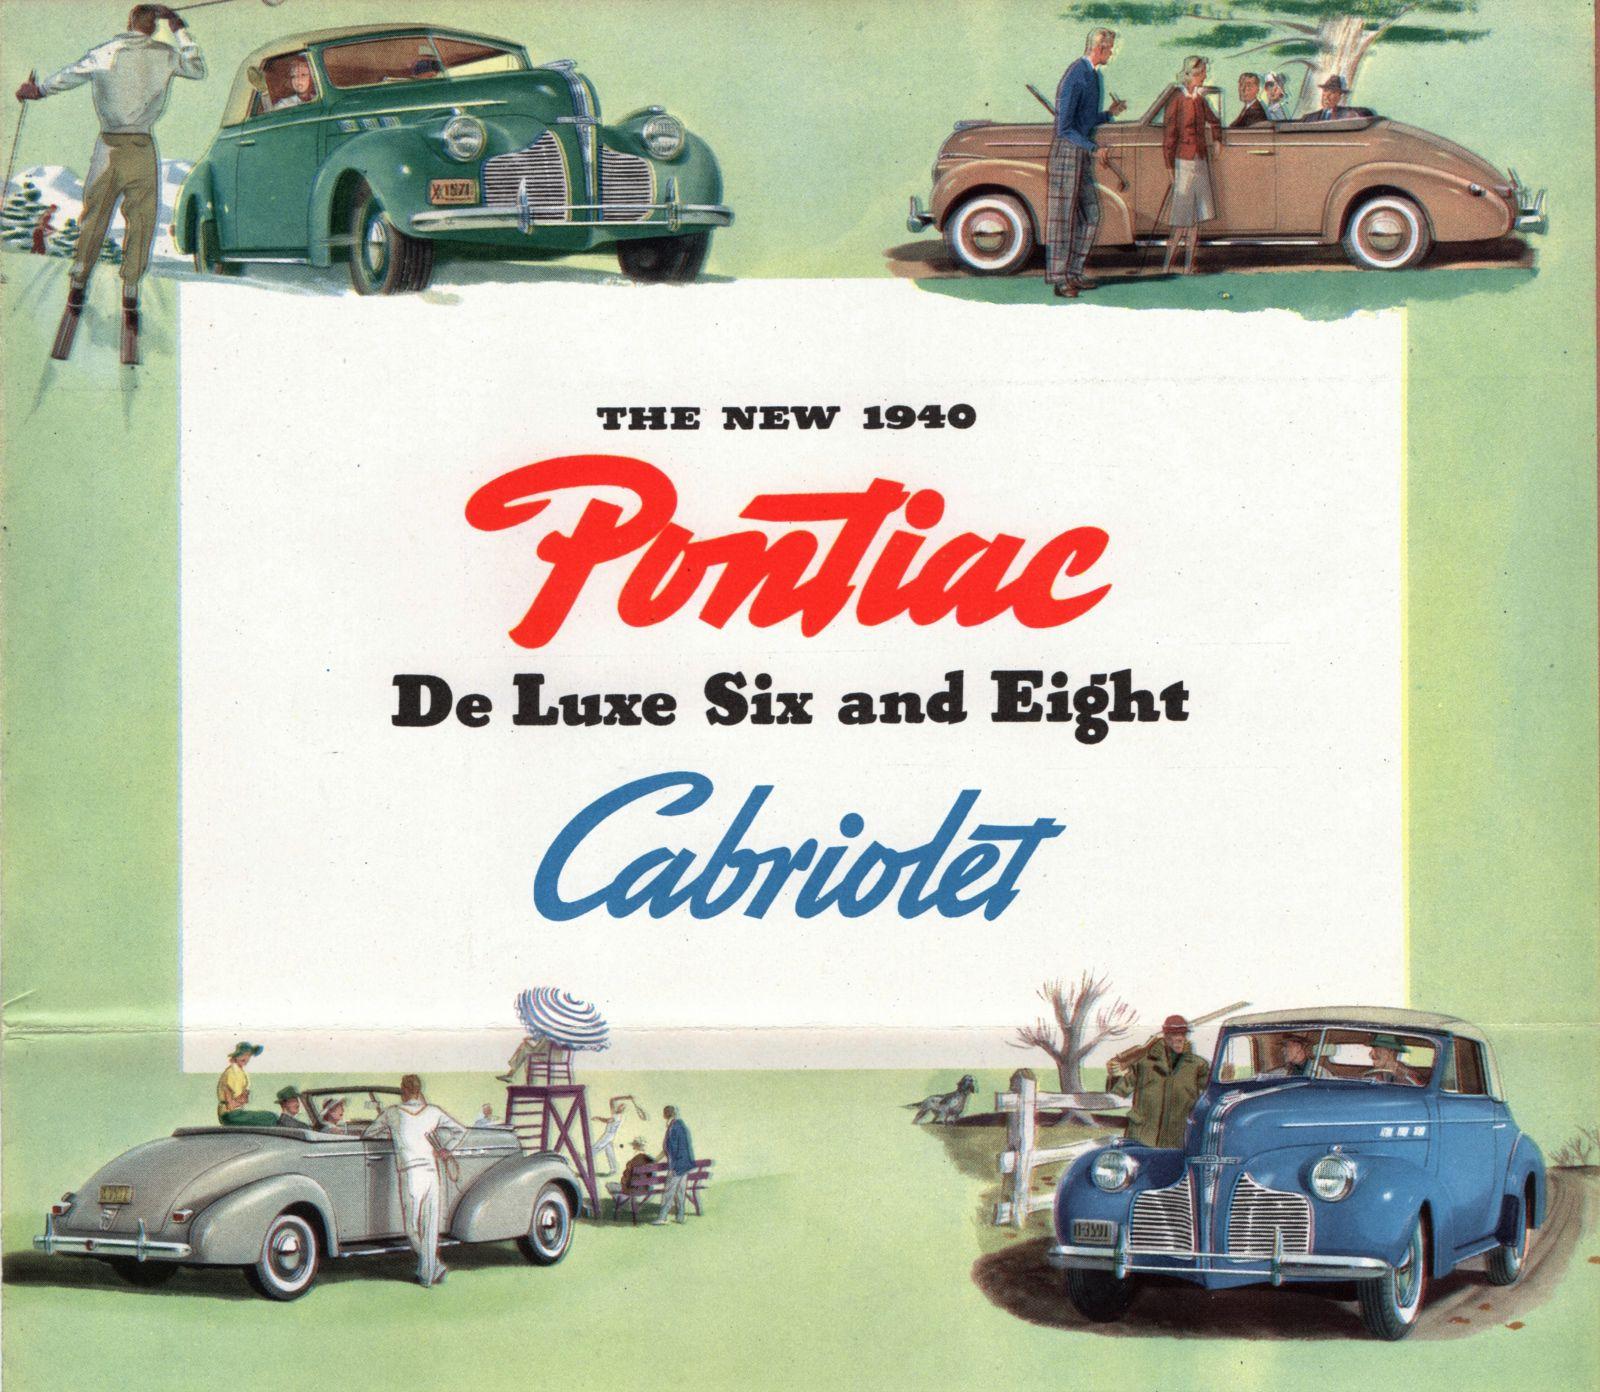 1940 Pontiac De Luxe Six and Eight Cabriolet